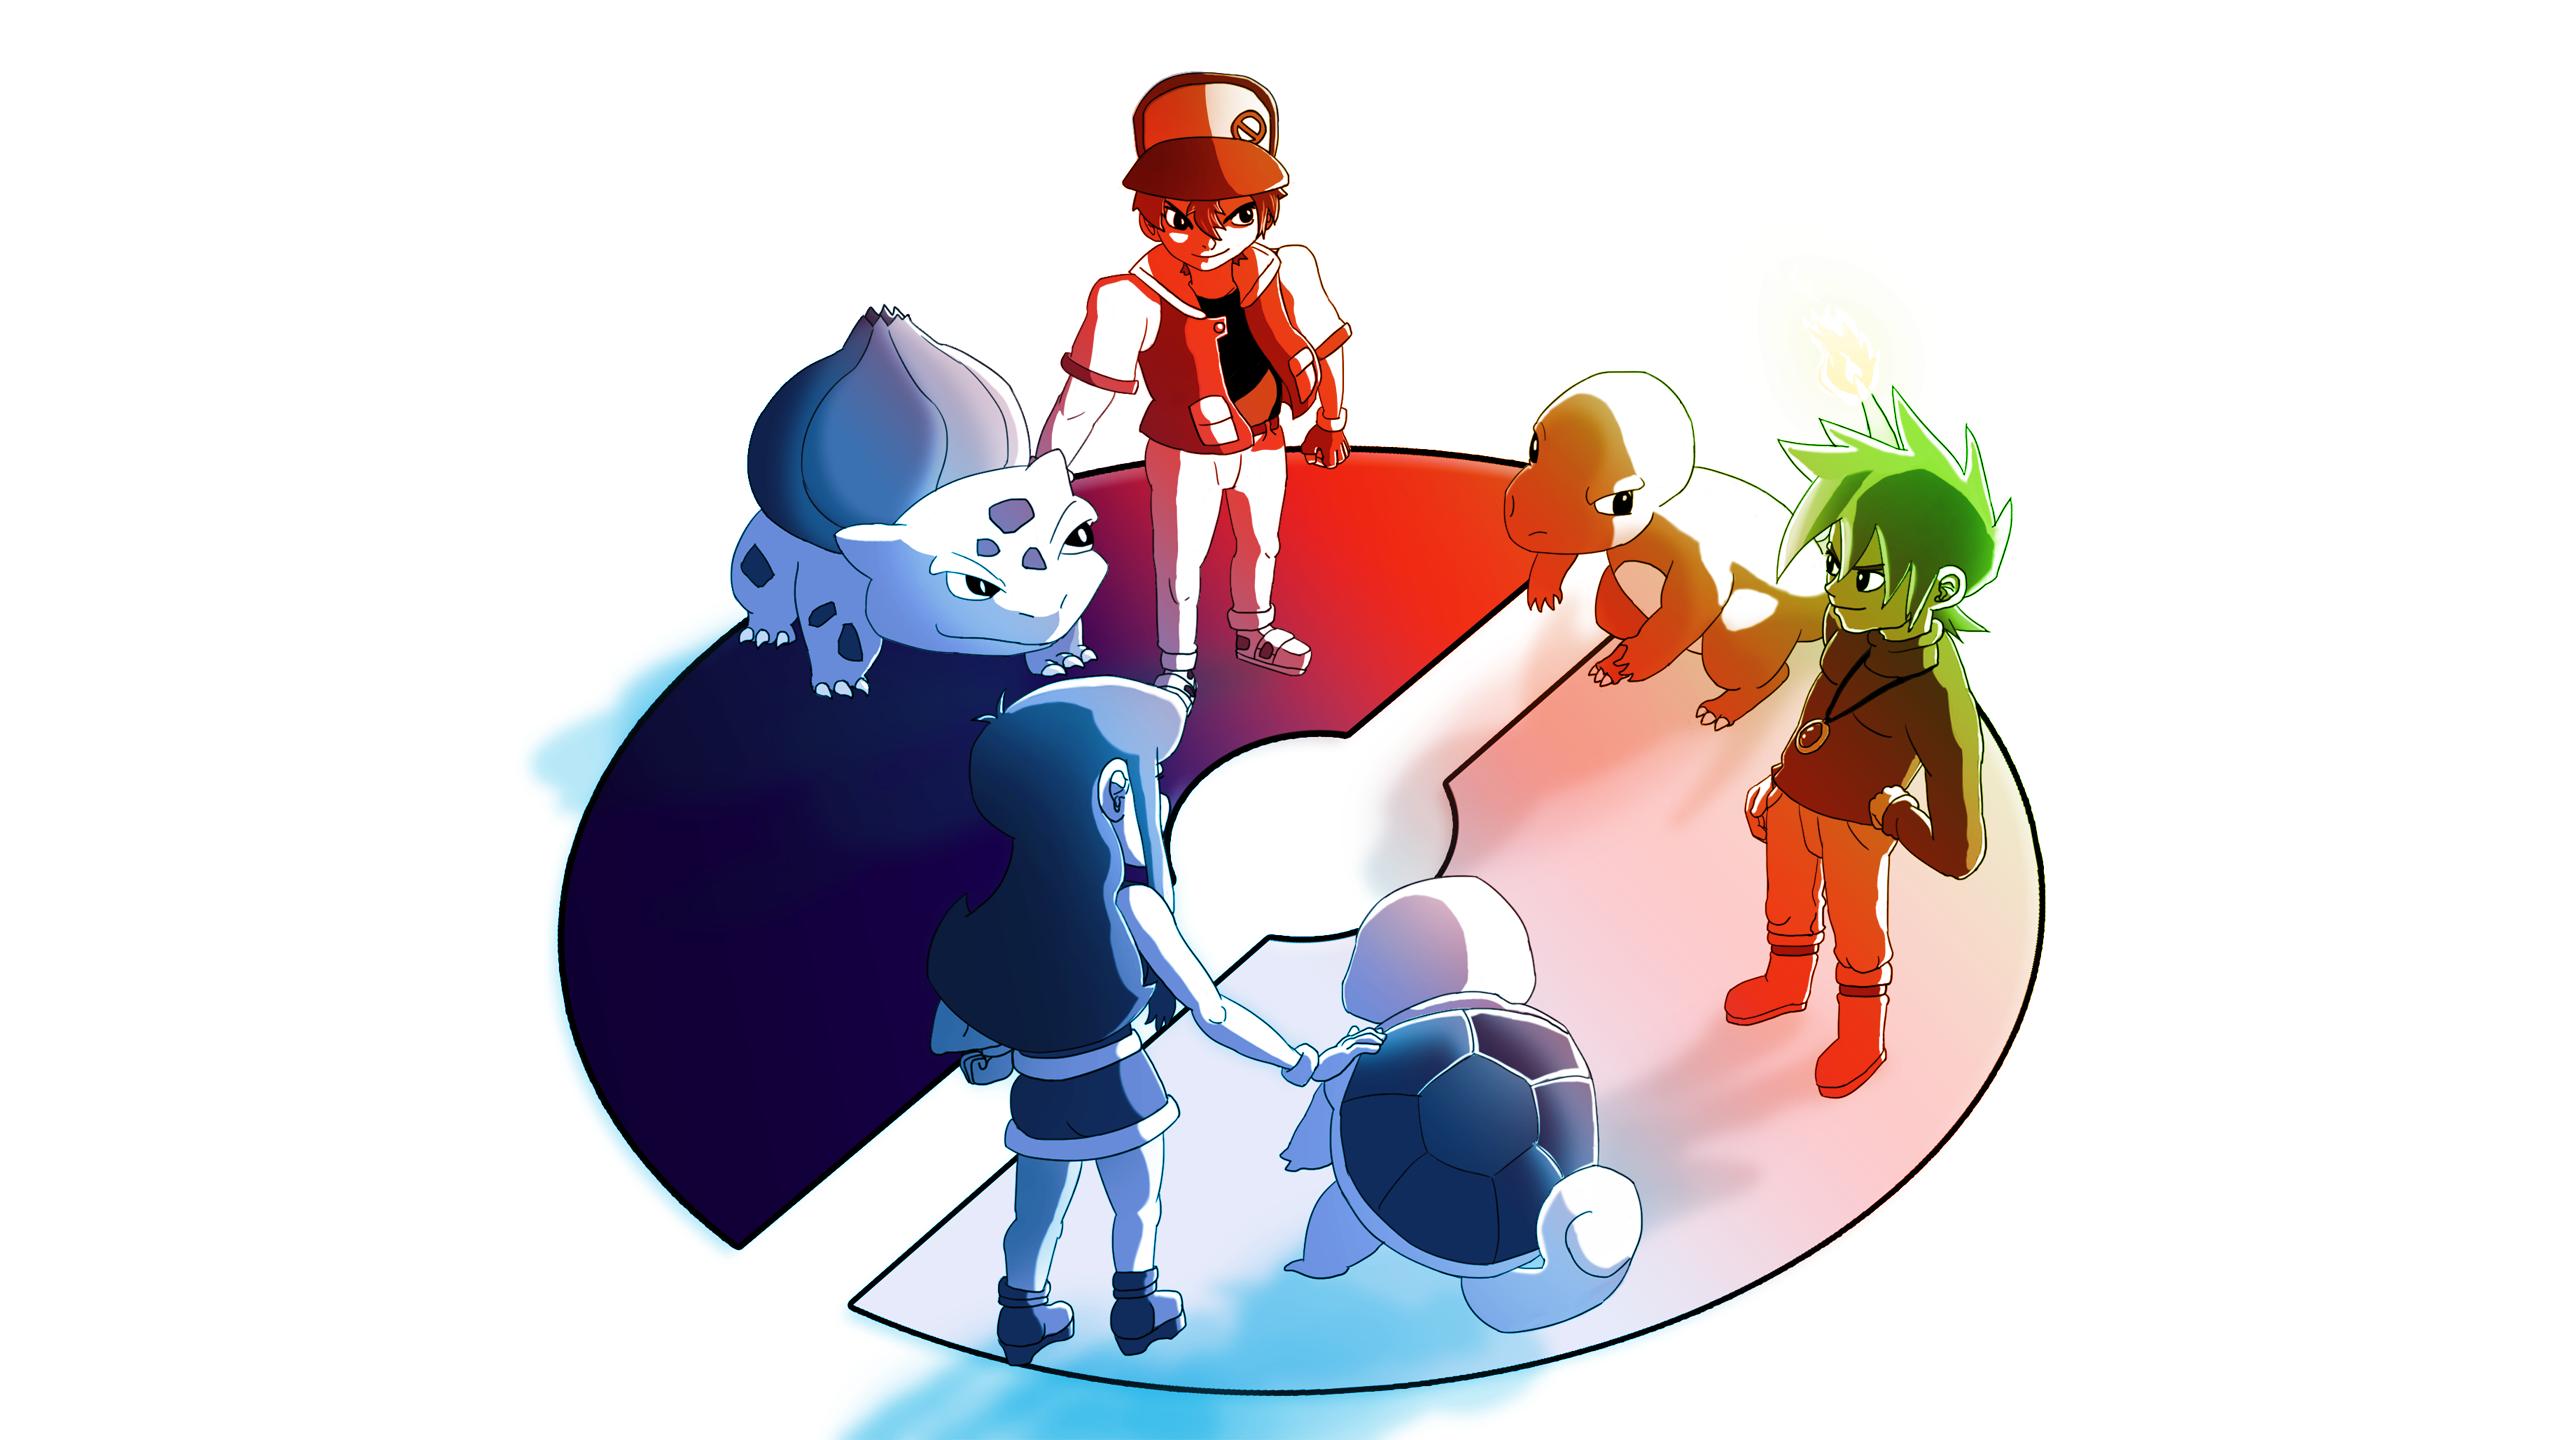 Pokemon Trainer Wallpapers 2560x1440